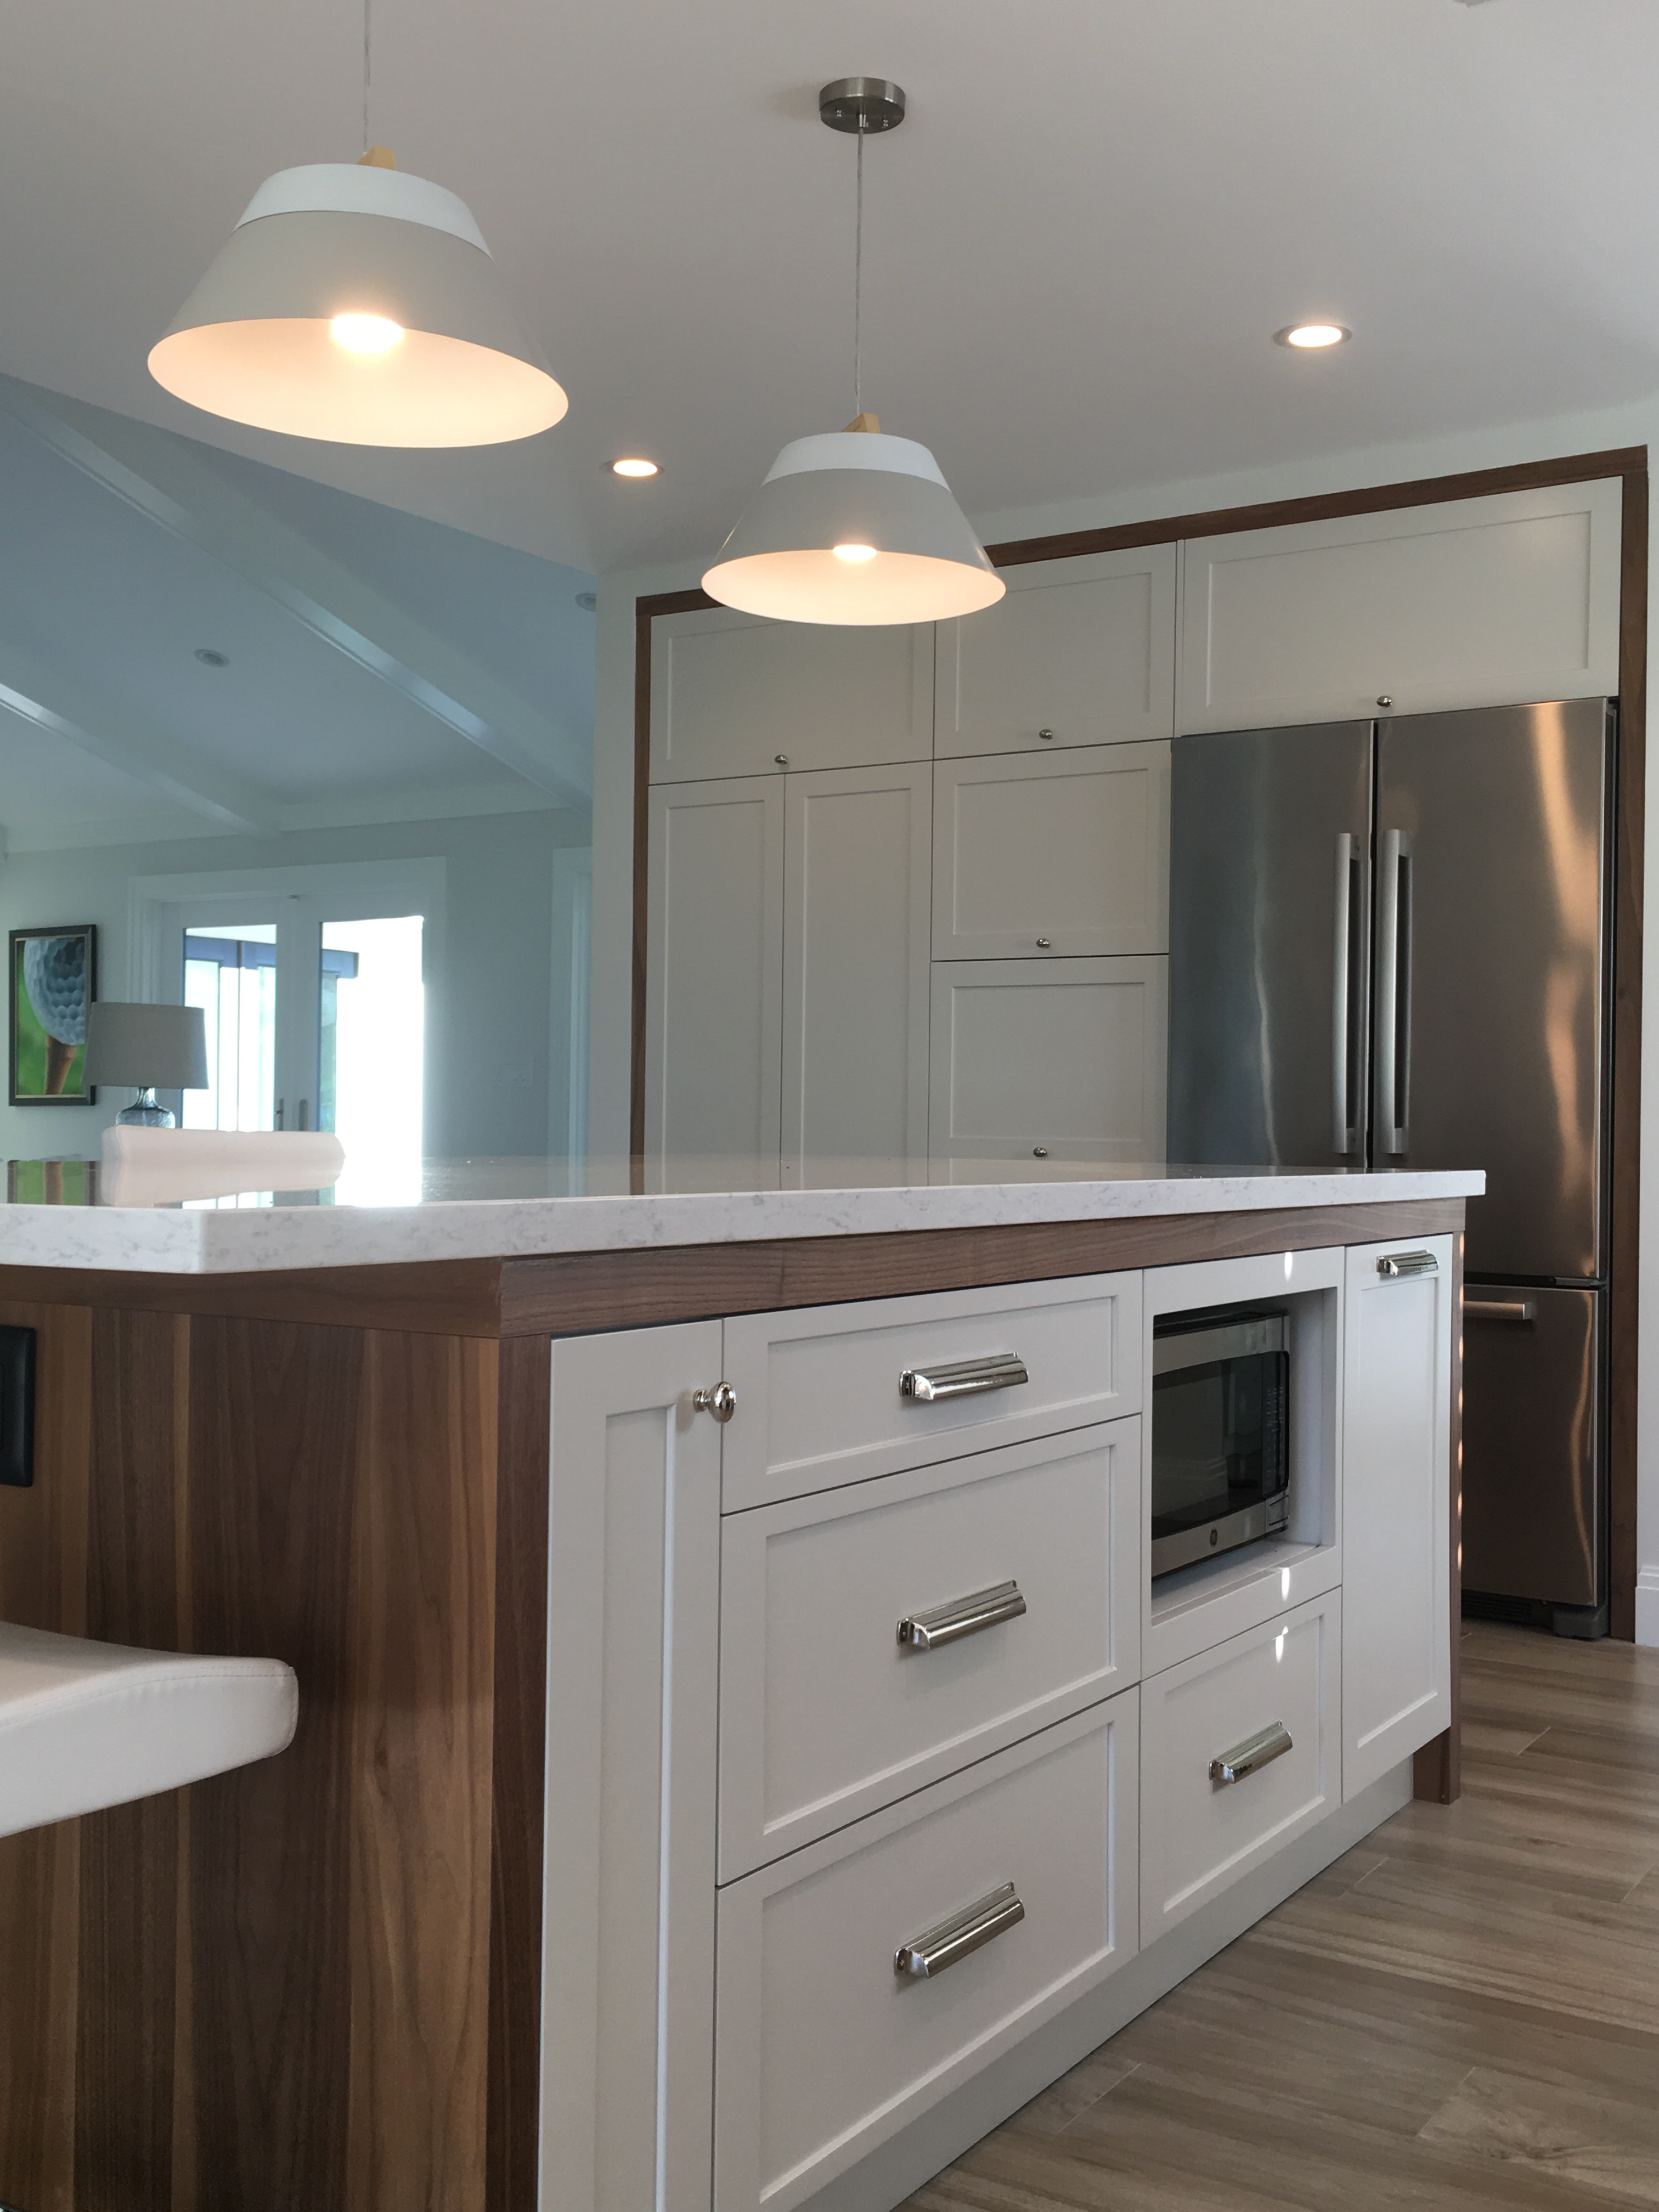 Tops Kitchen Pompano Beach : Kitchen cabinet design pompano beach remodeling